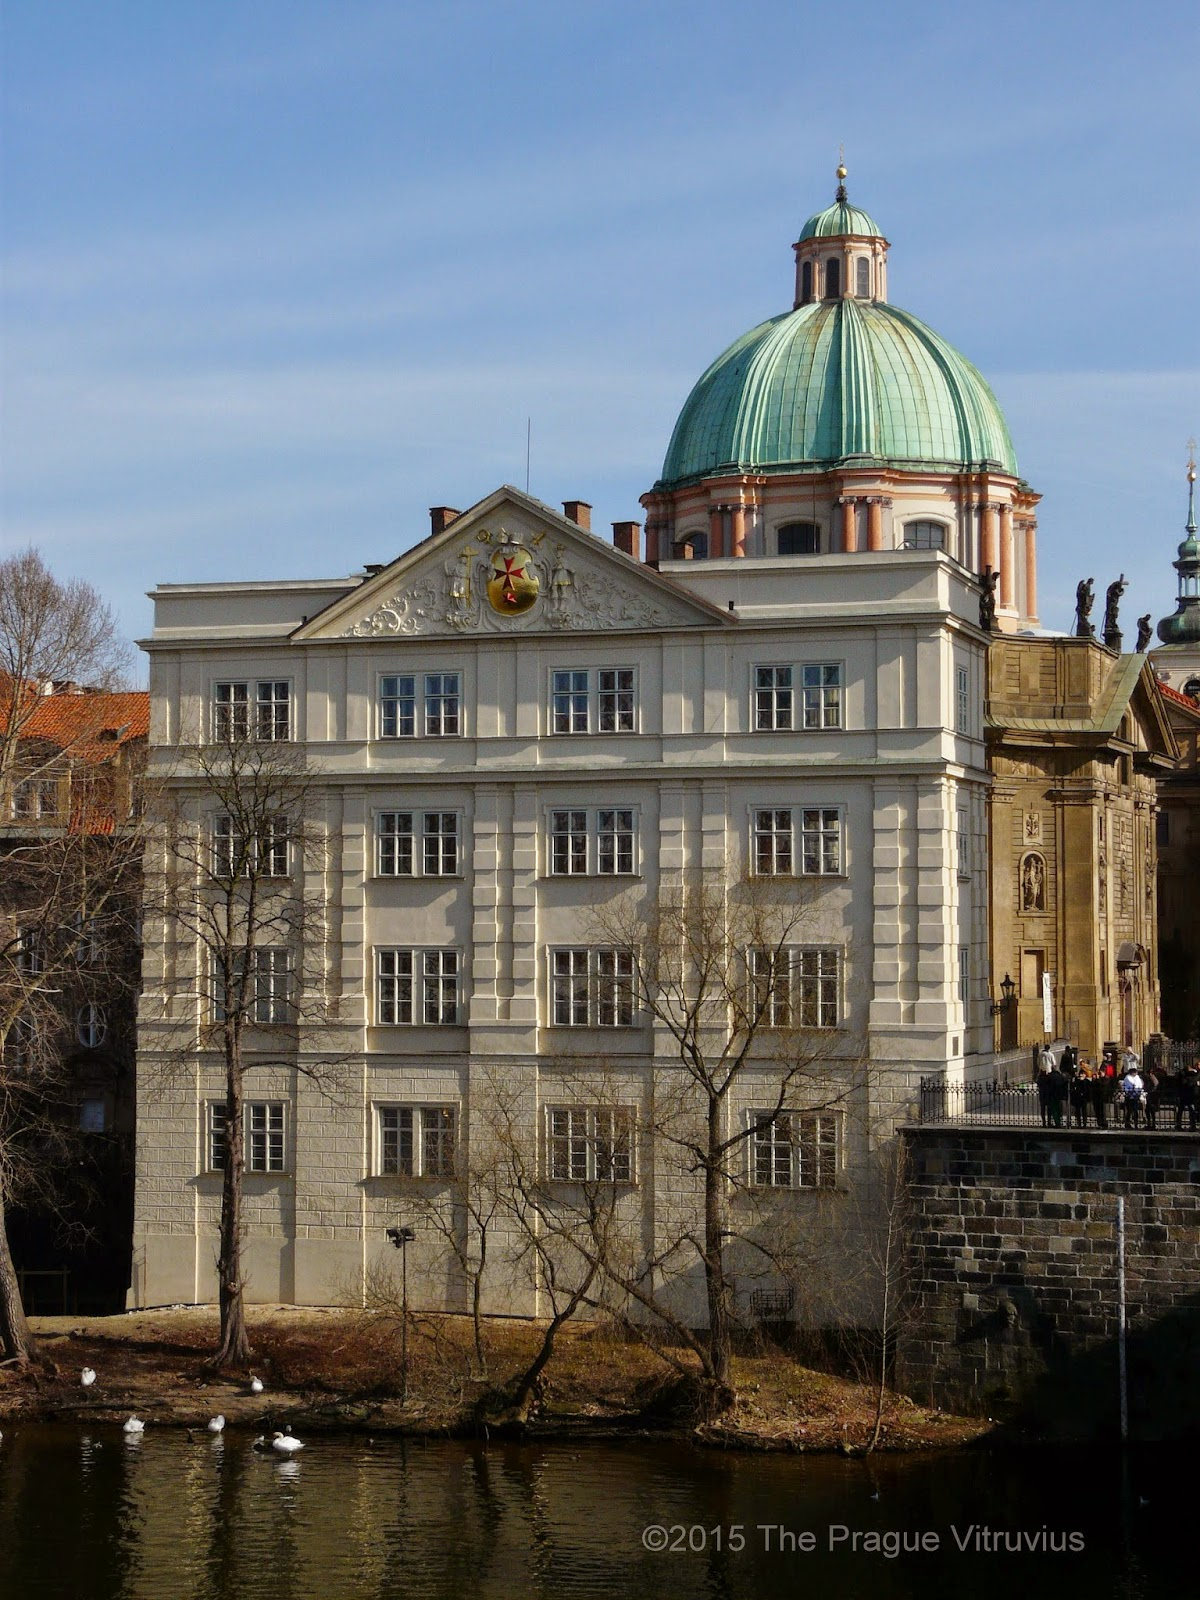 Křižovnické náměstí 191/3: Monastery and church of St Francis